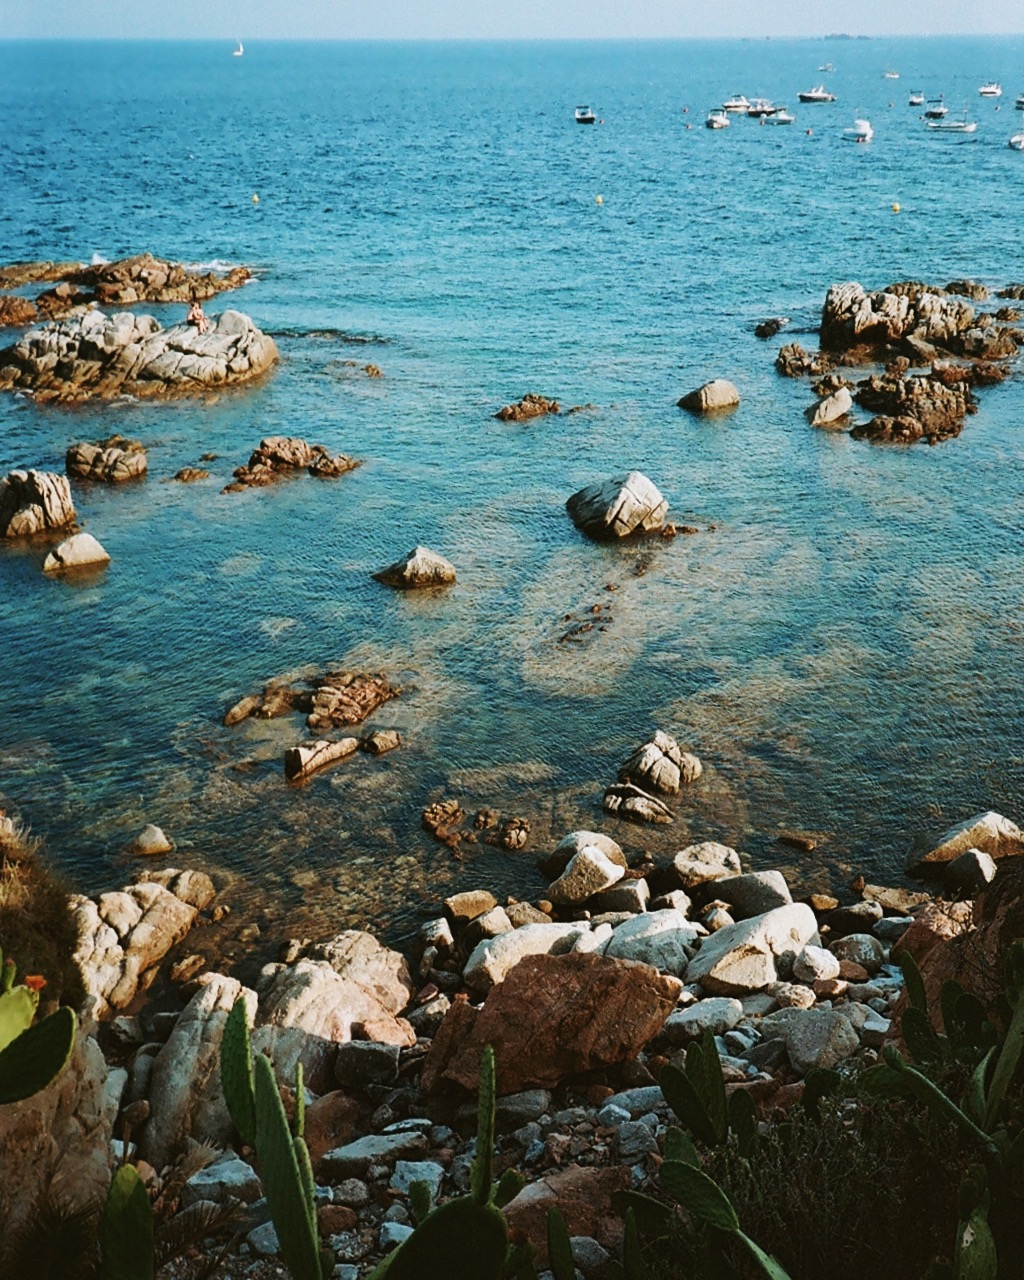 Walking from Llafranc to Calella de Palafrugell in Costa Brava!